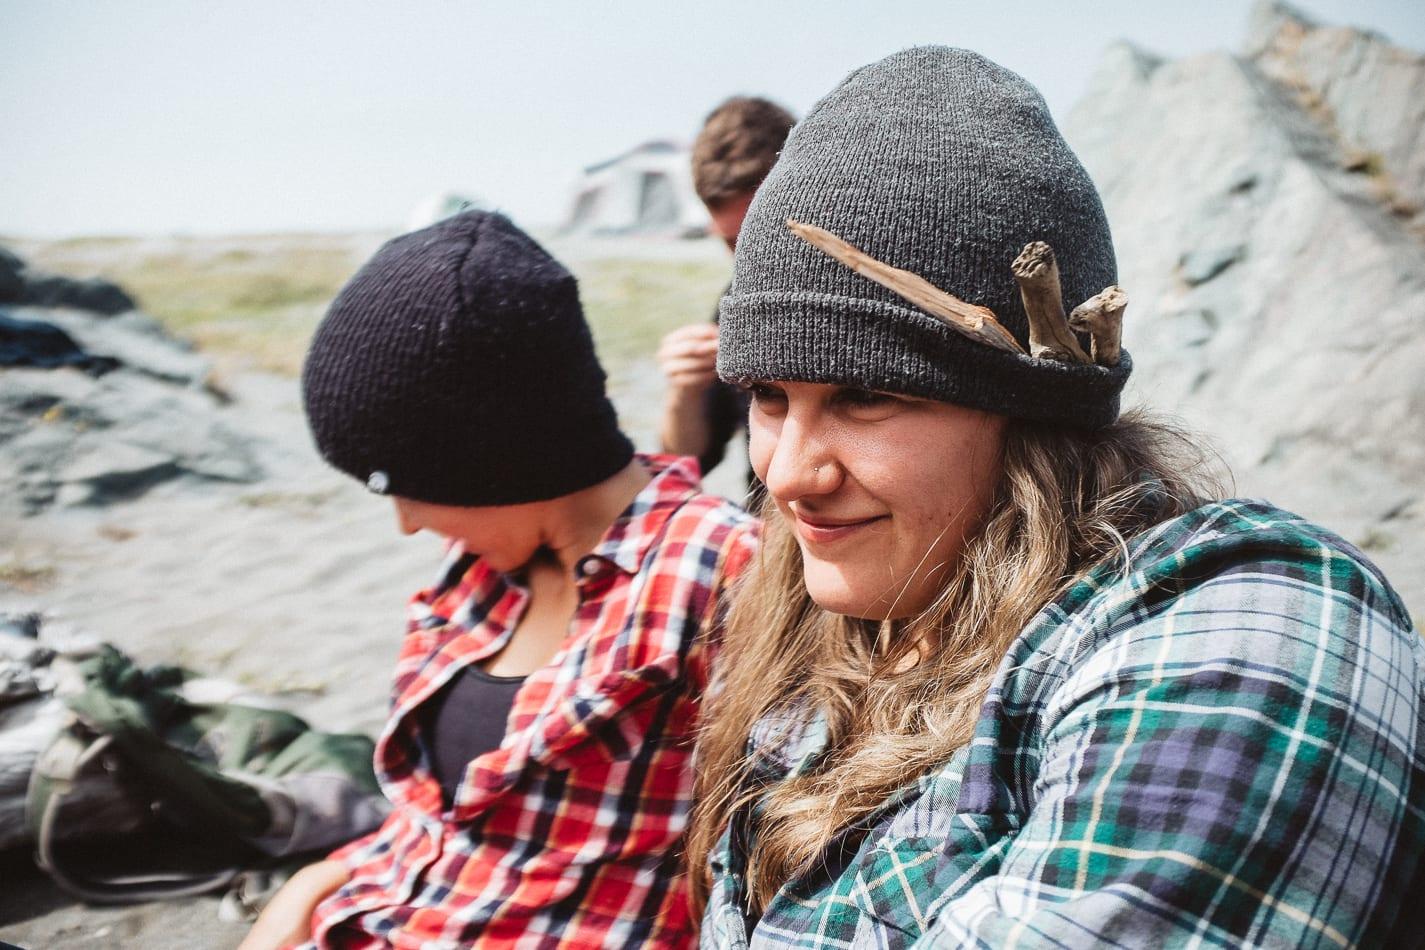 patricks-point-beach-camping-california-adventure-photographer-21